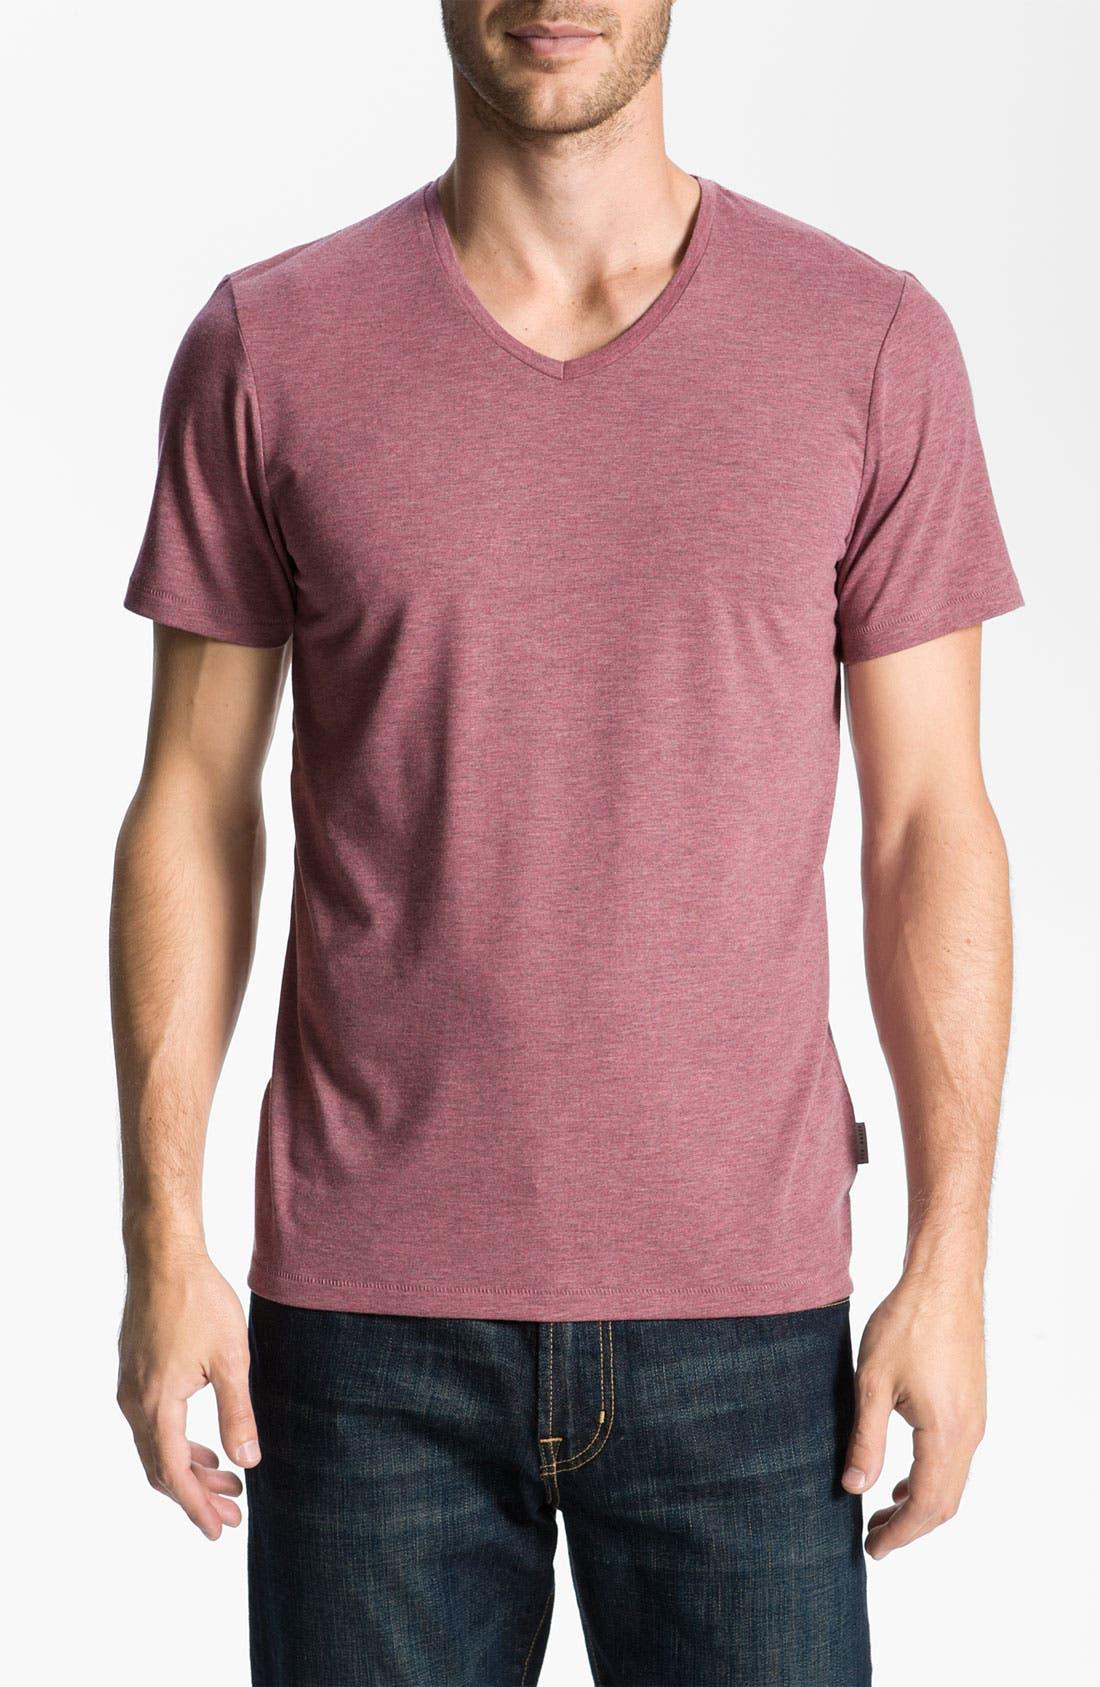 Main Image - Ted Baker London V-Neck T-Shirt